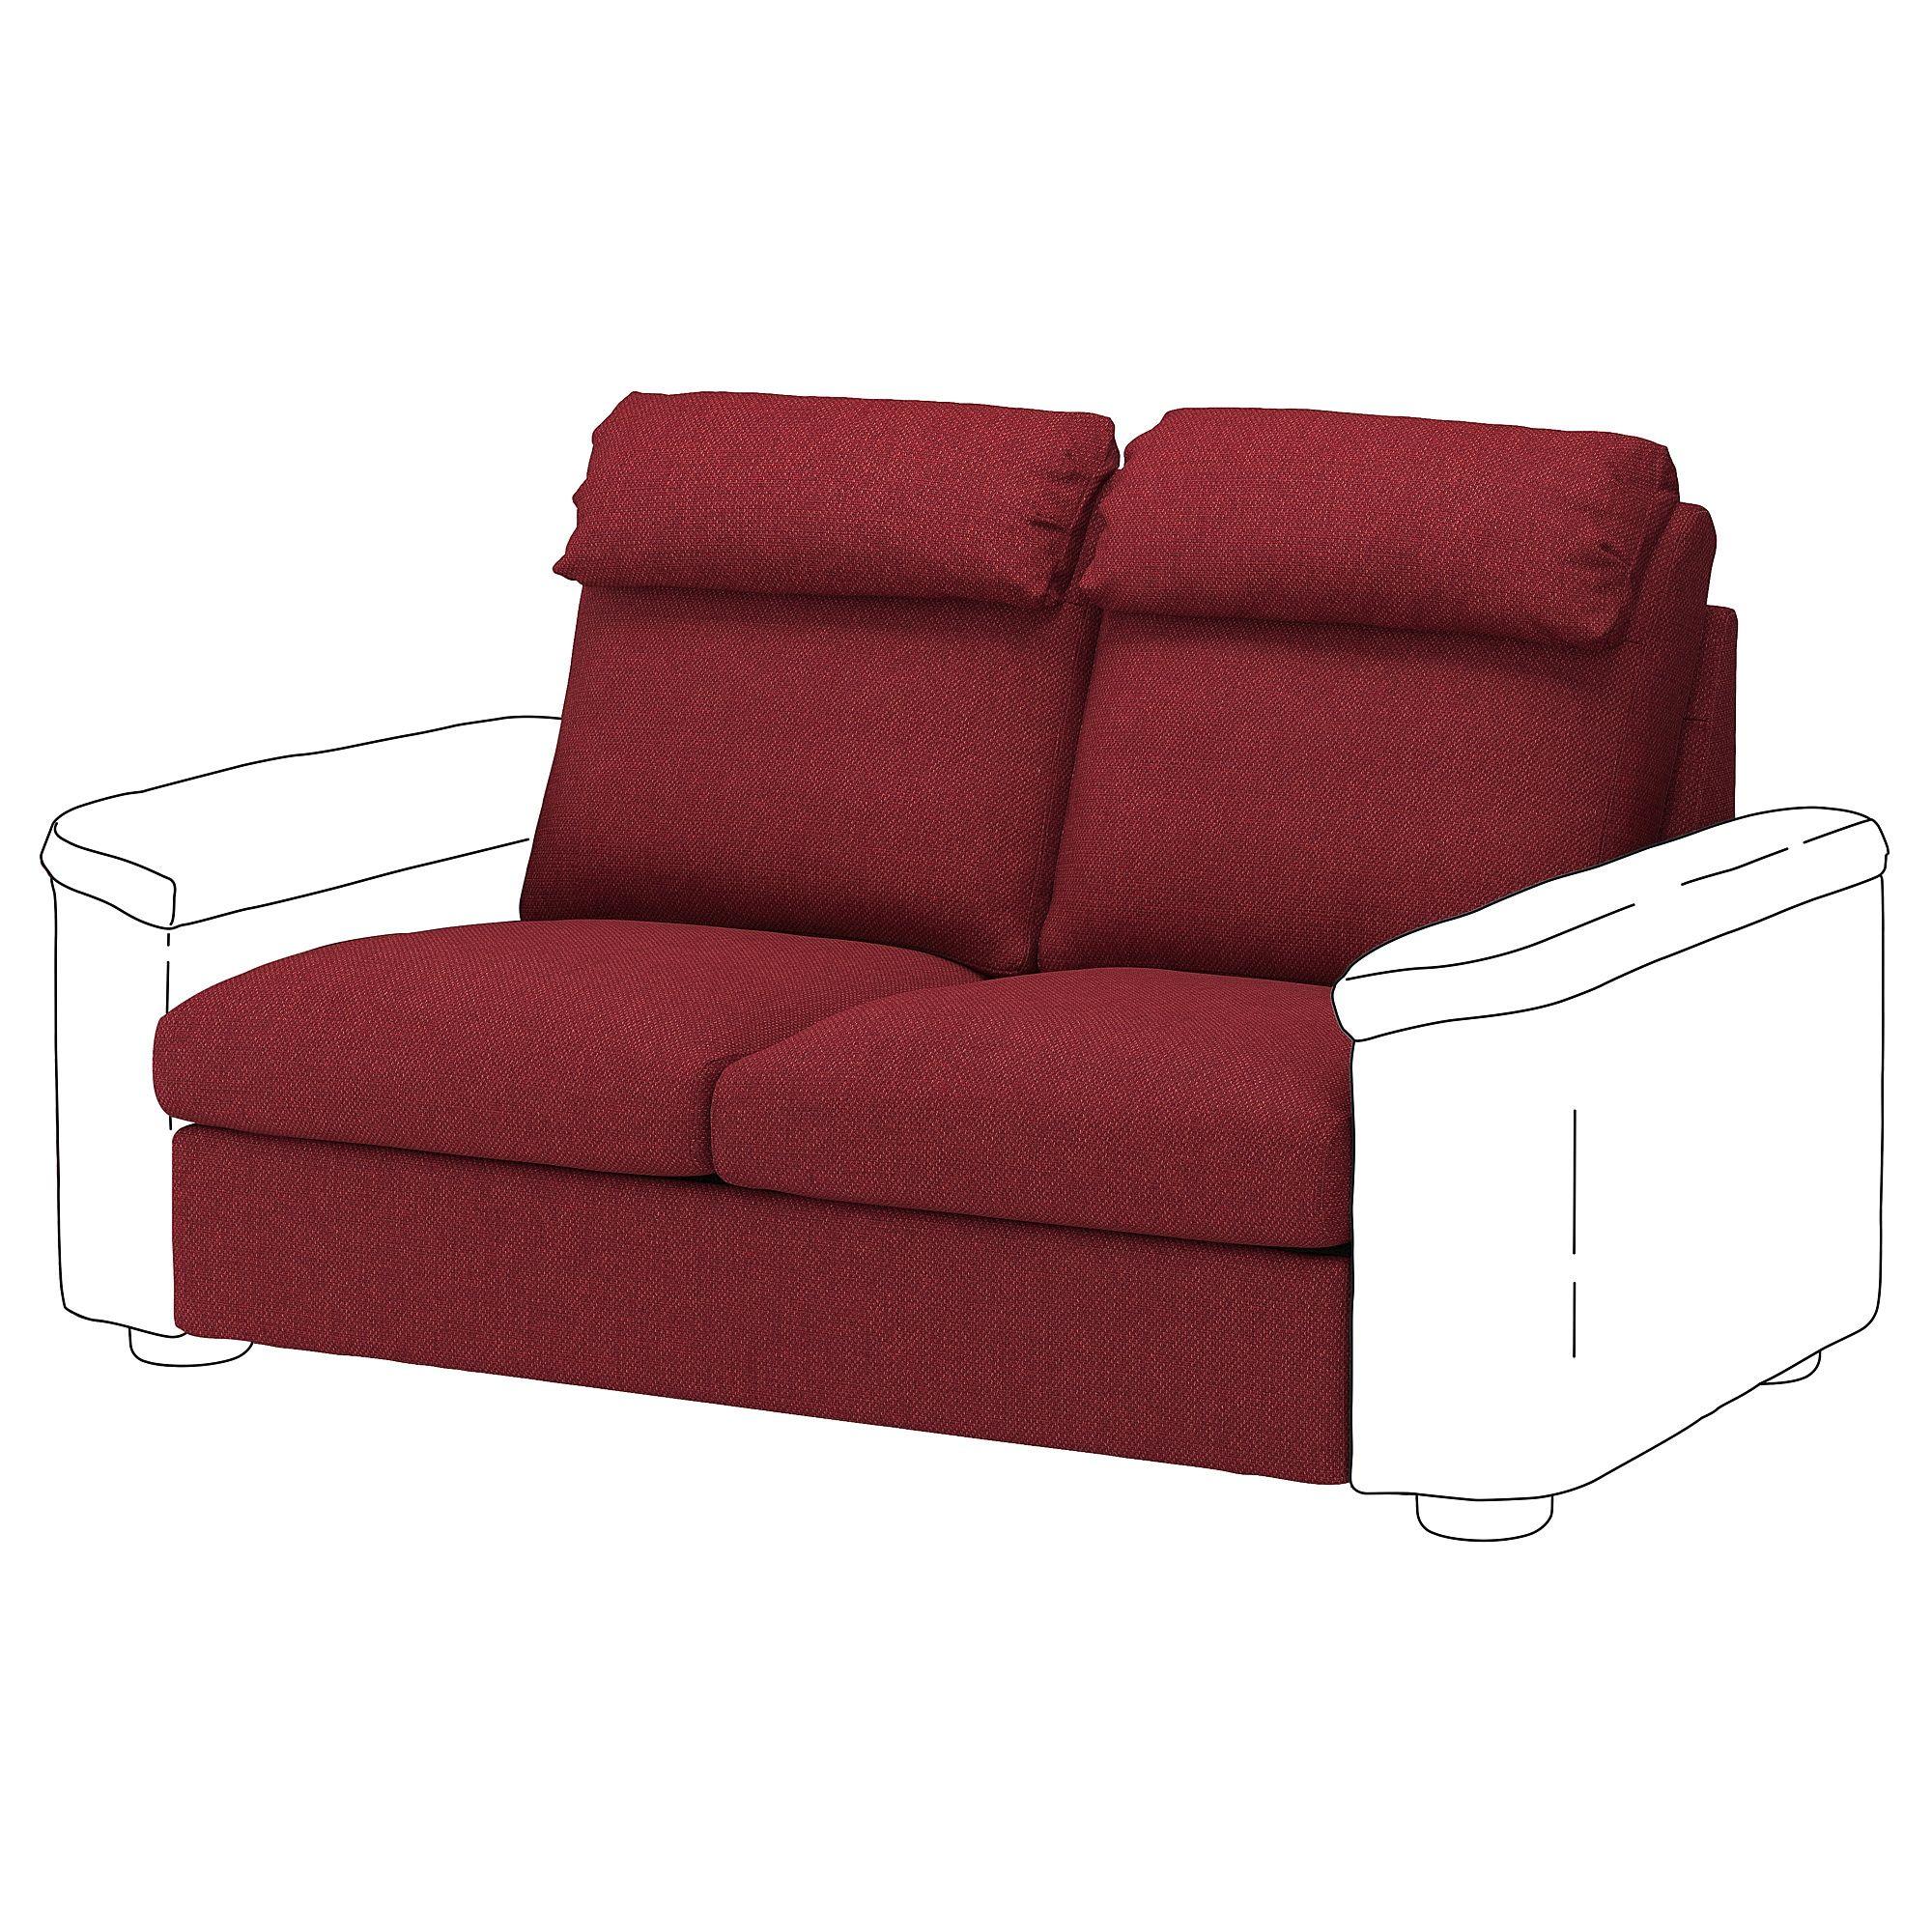 Ikea Lidhult Loveseat Sleeper Section Lejde Red Brown In